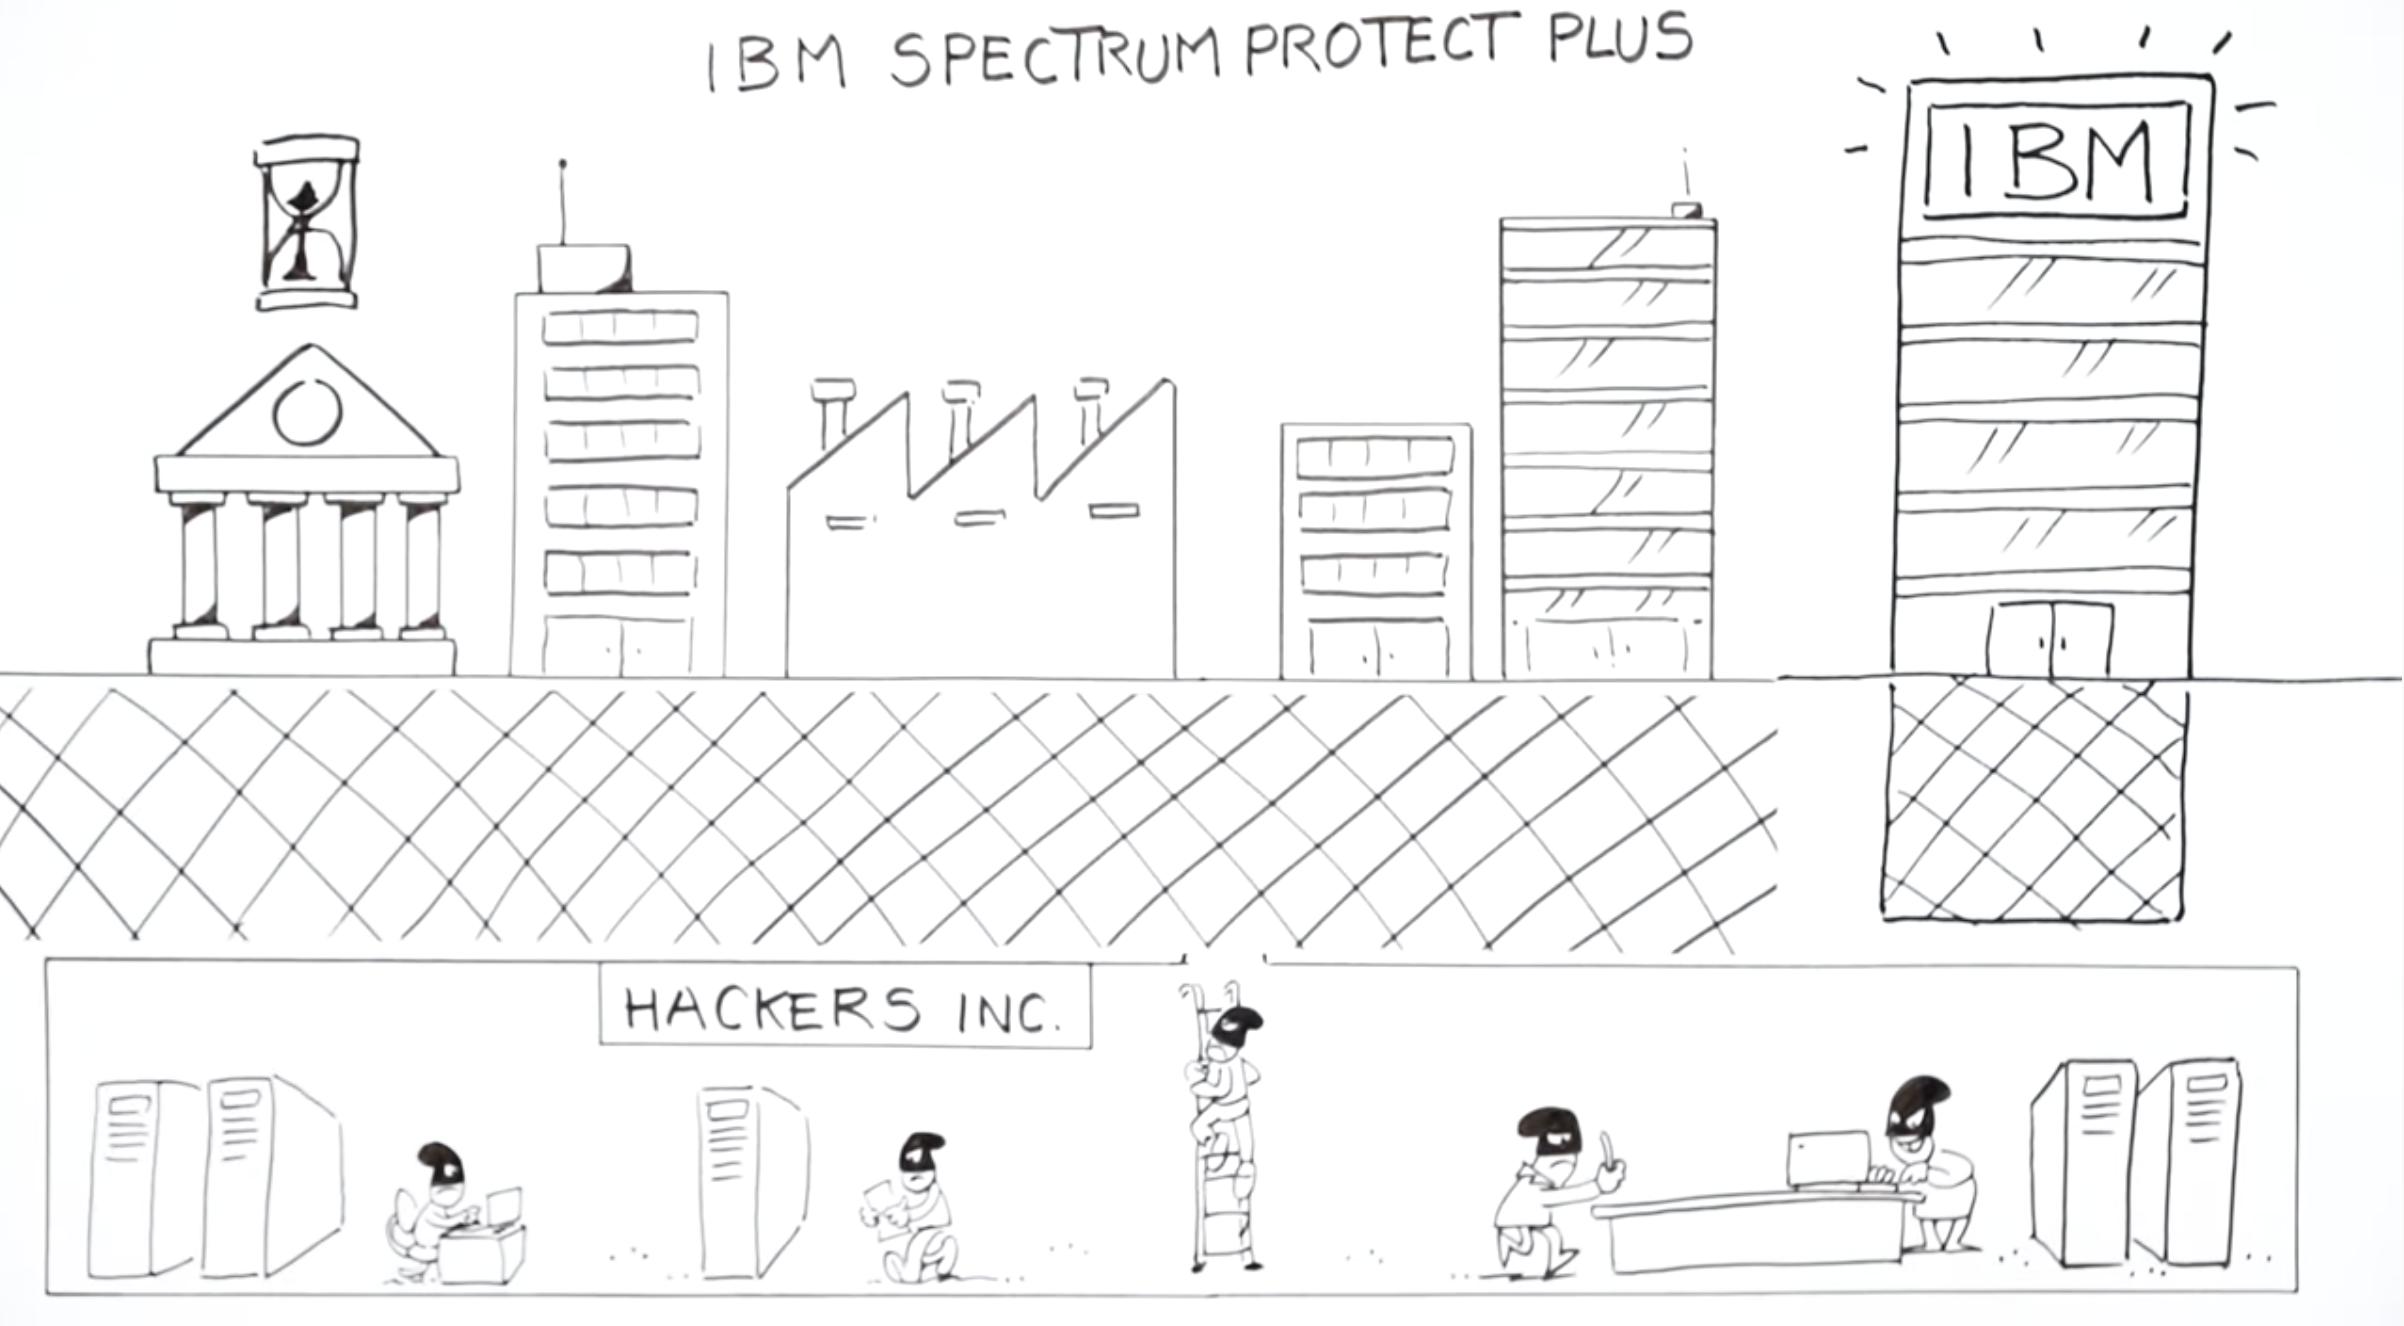 Vídeo: IBM Spectrum Protect Plus